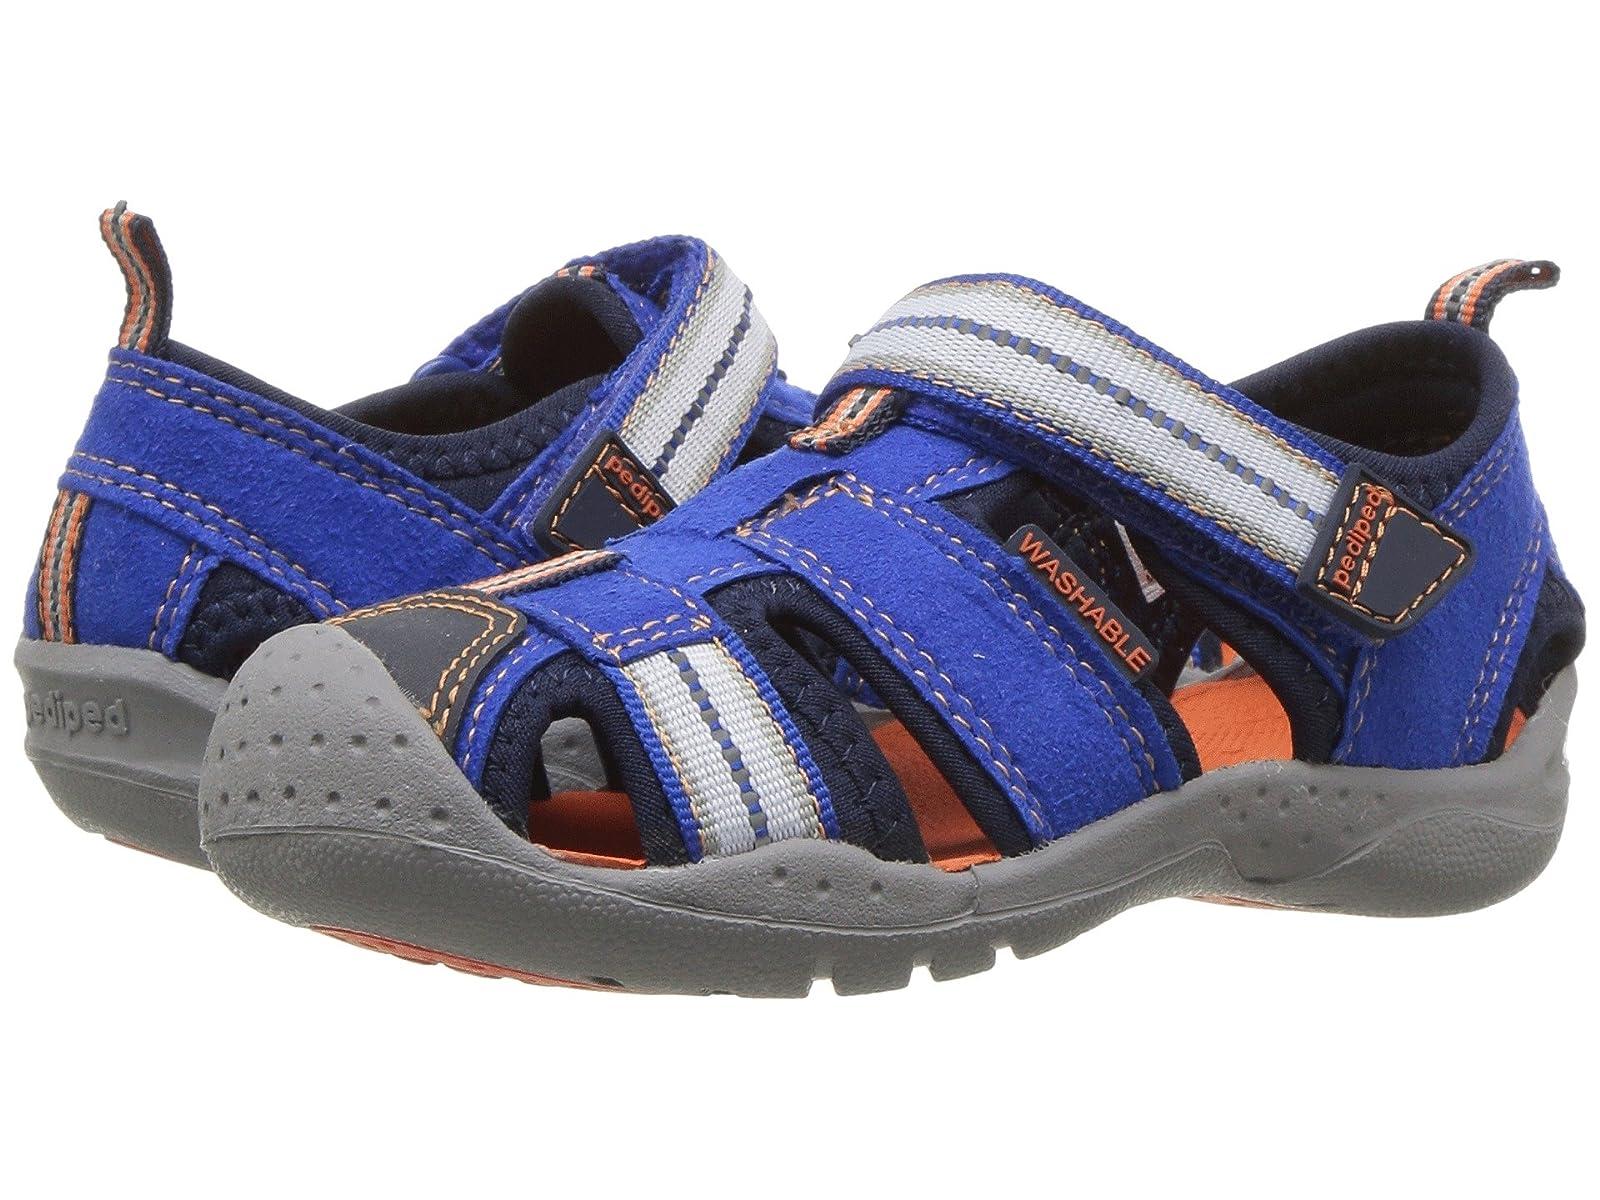 pediped Sahara Flex (Toddler/Little Kid)Atmospheric grades have affordable shoes